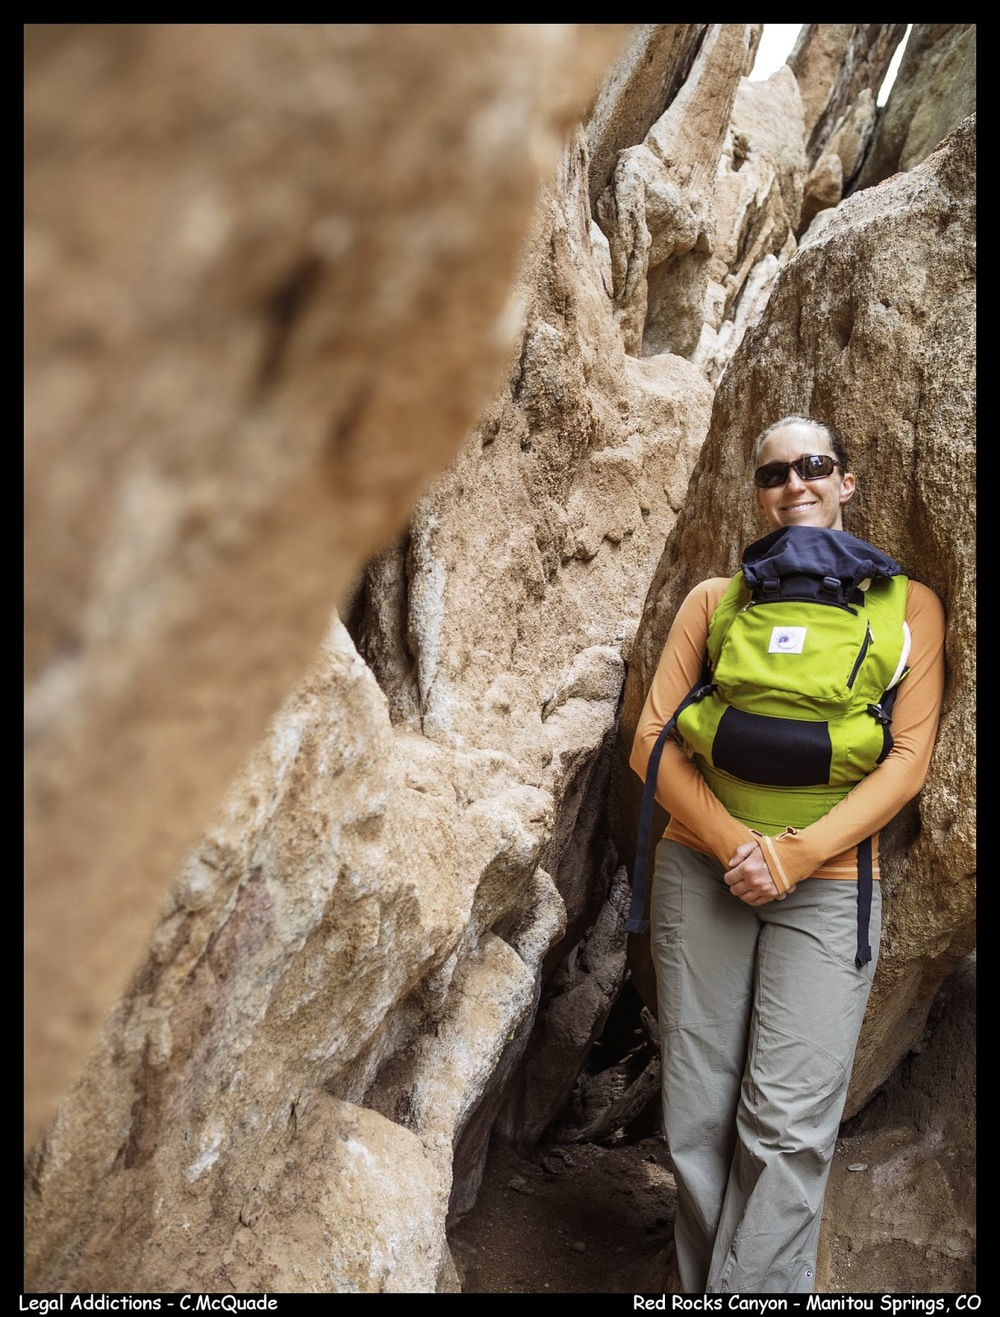 red+rocks+canyon+hike-20141562.jpg